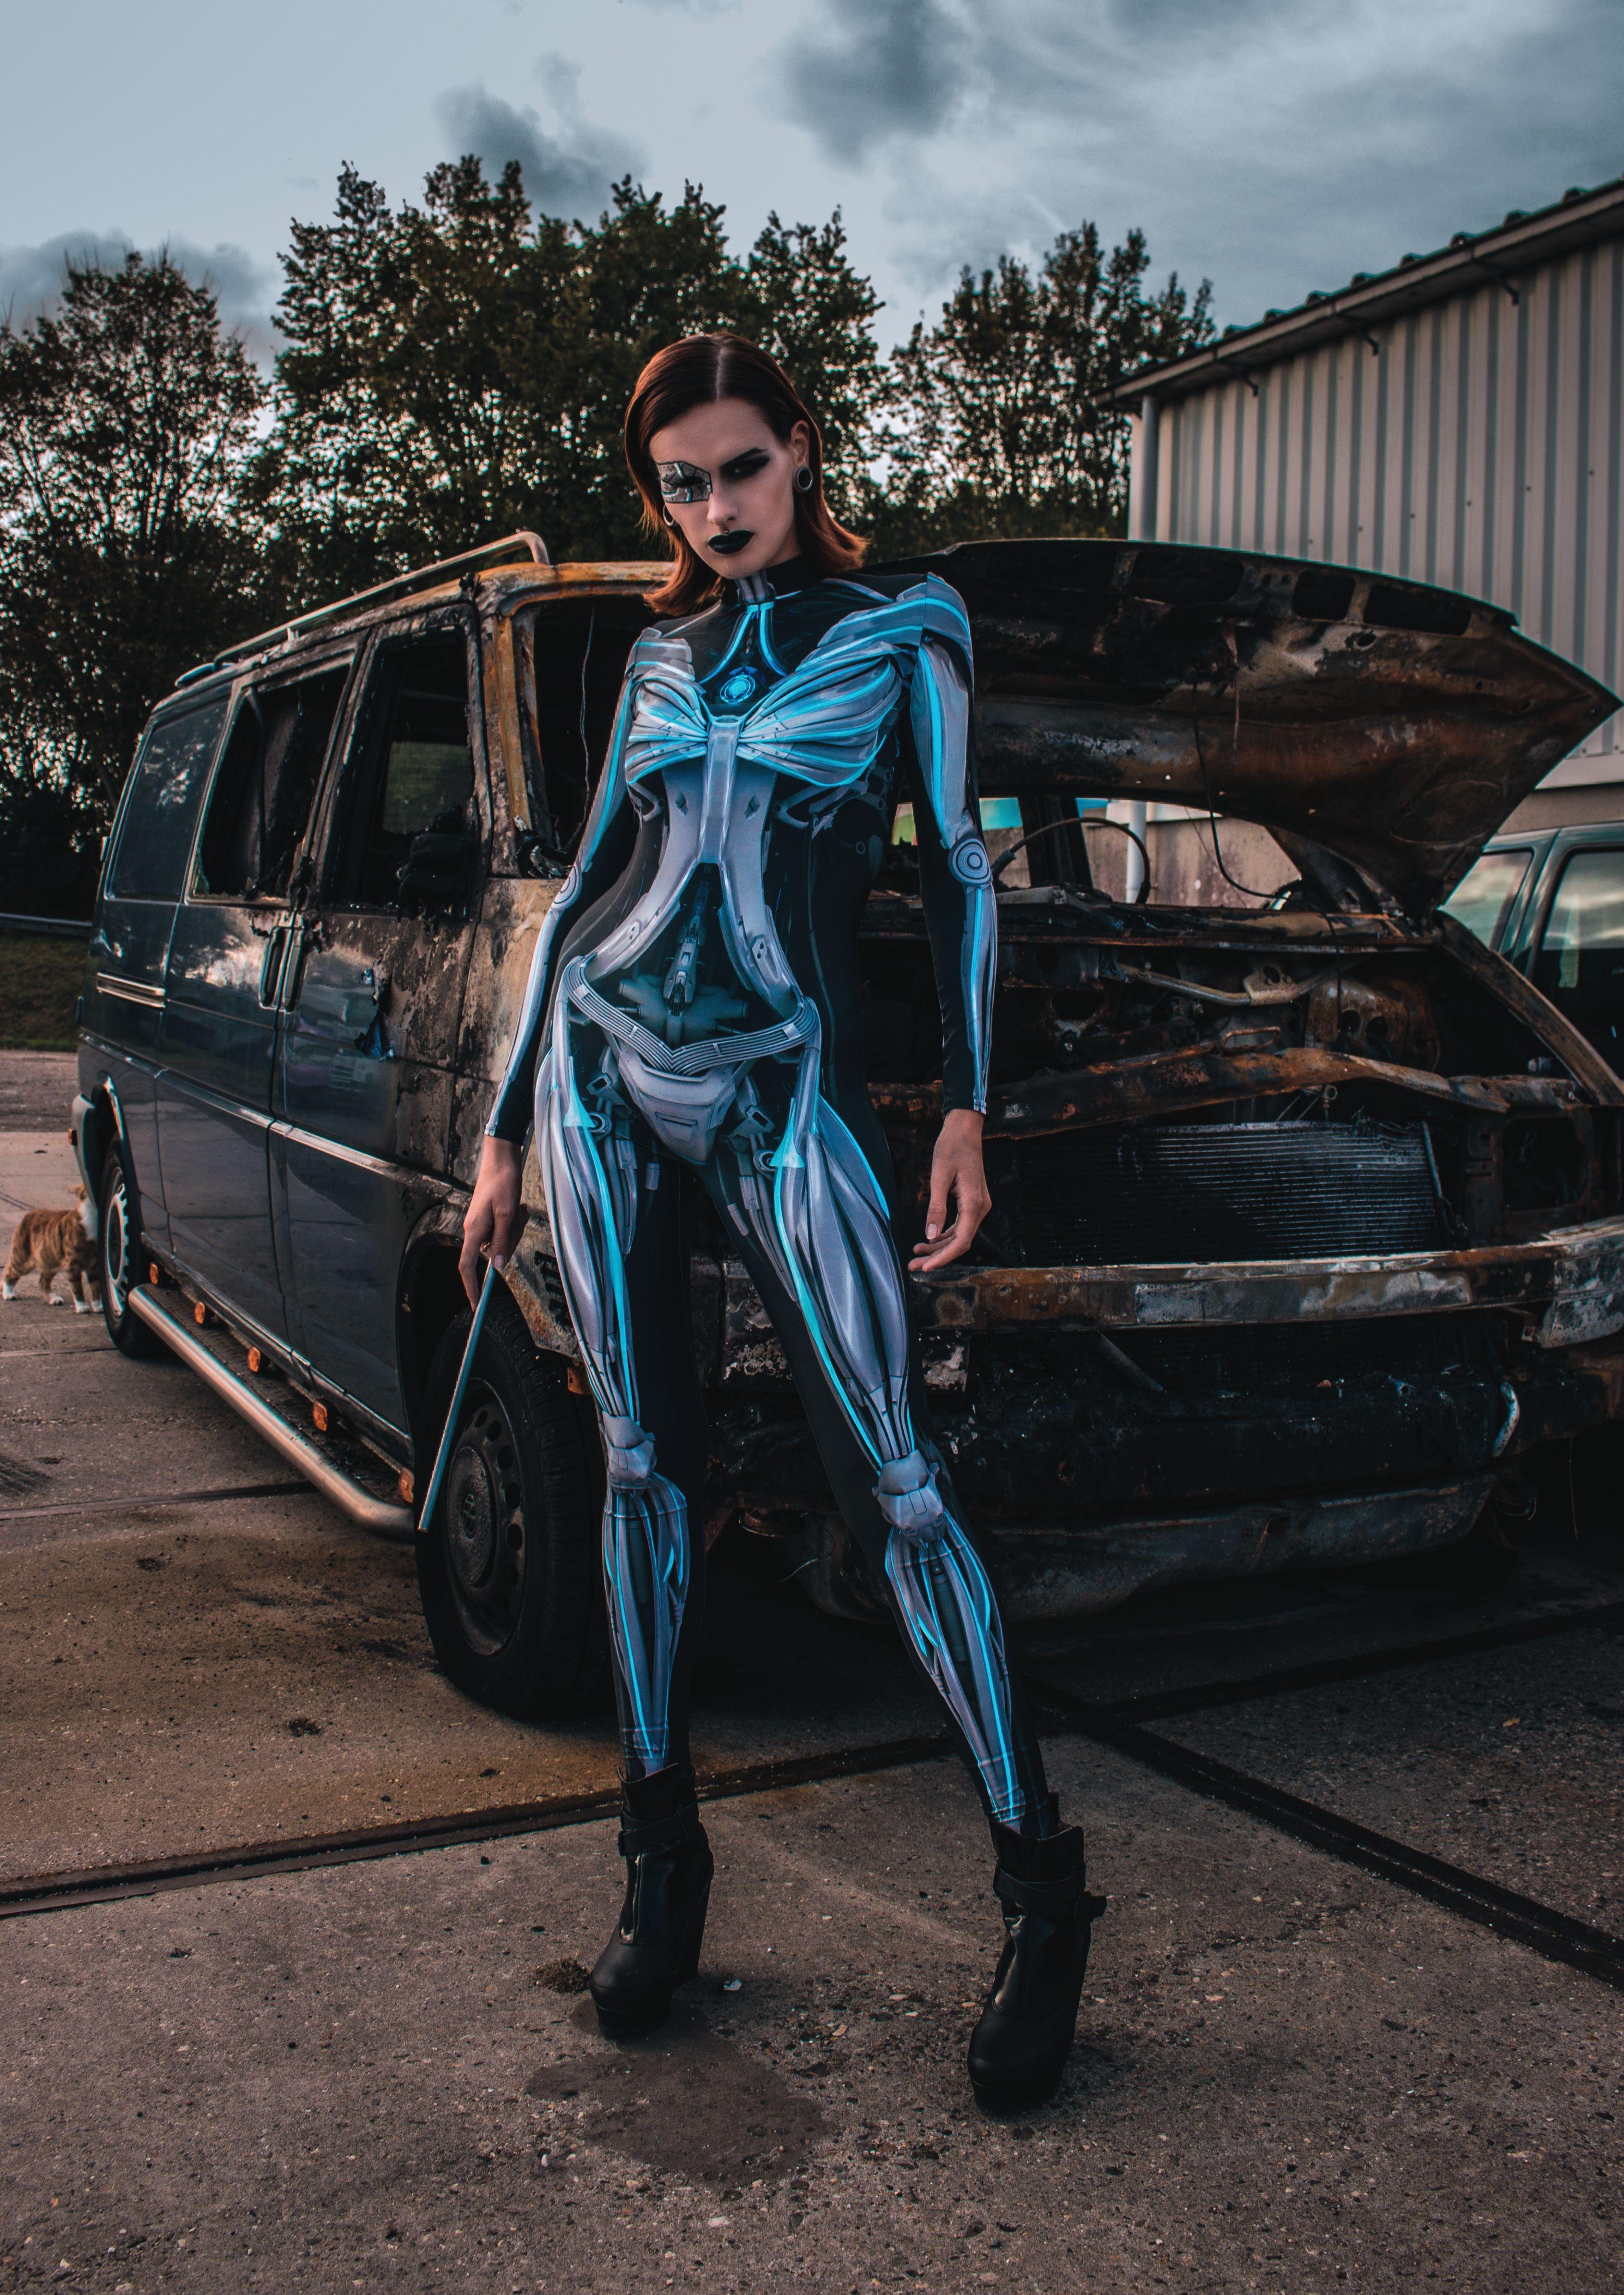 Machina Costume in 2020 Costumes for women, Cosplay